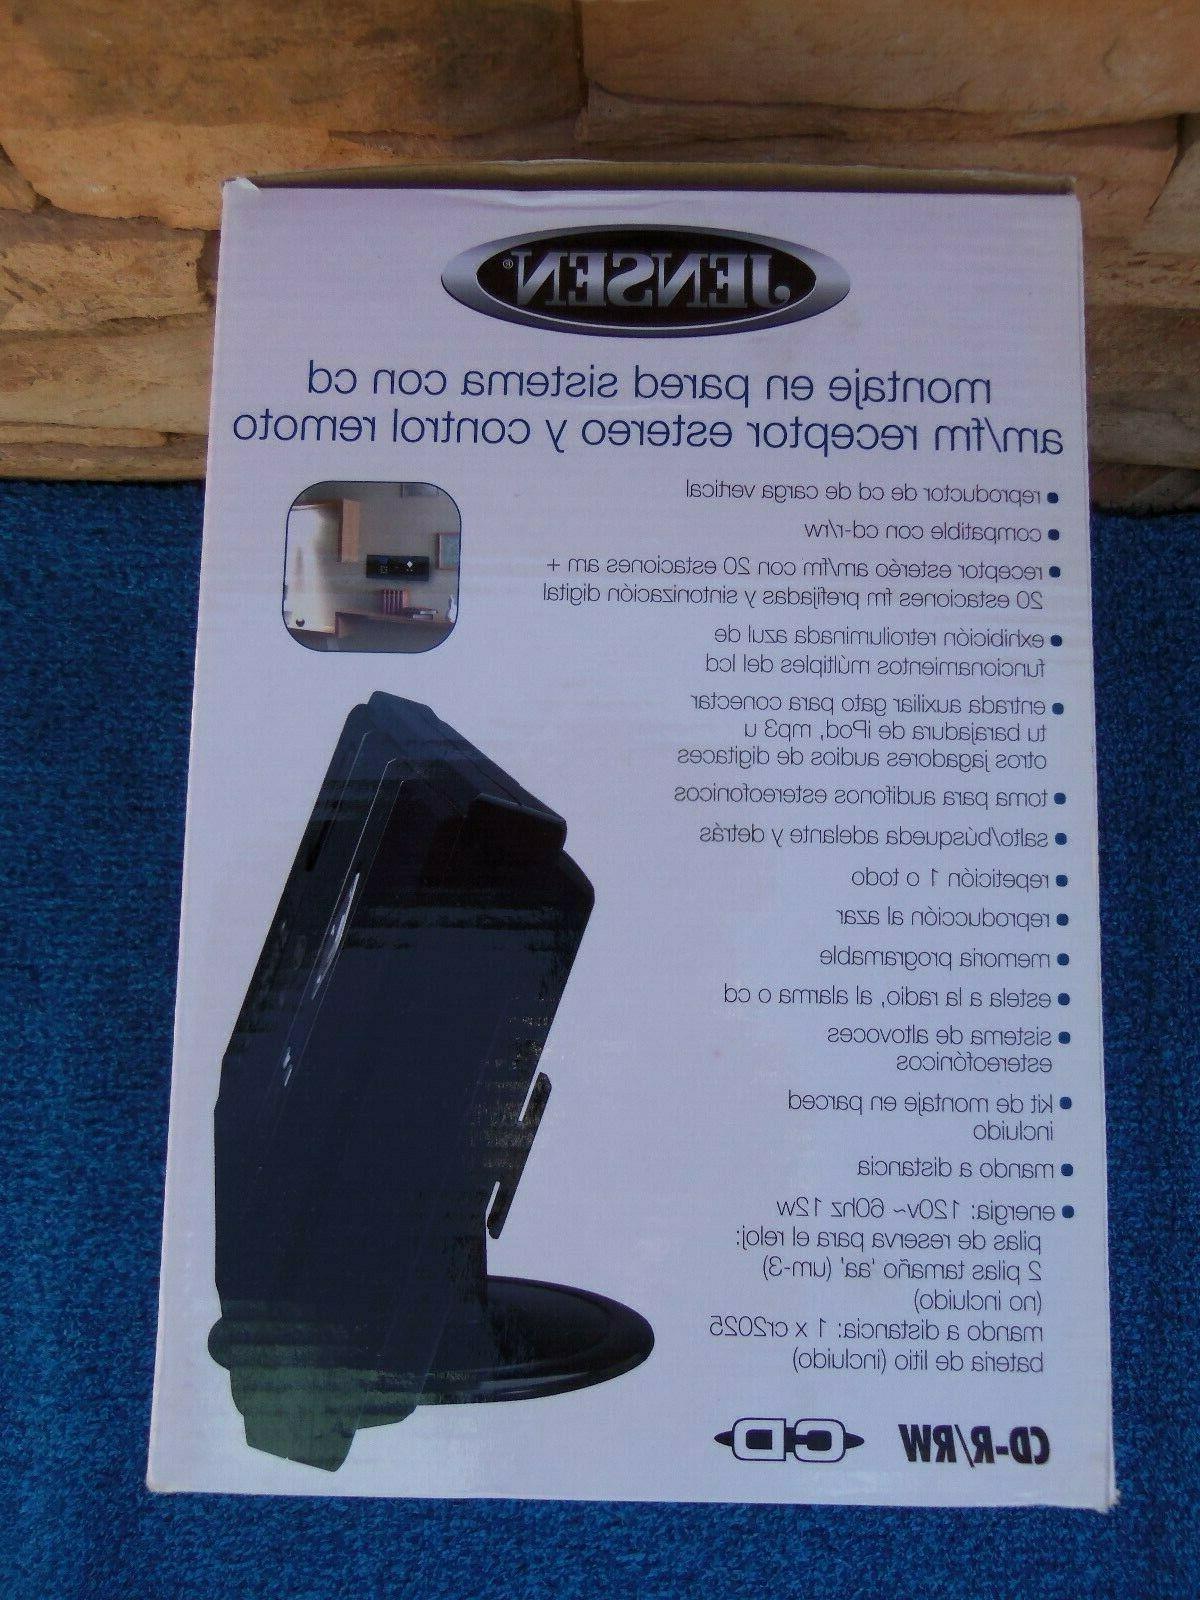 Jensen JMC-180 Wall-Mountable CD System AM/FM Stereo Receiver